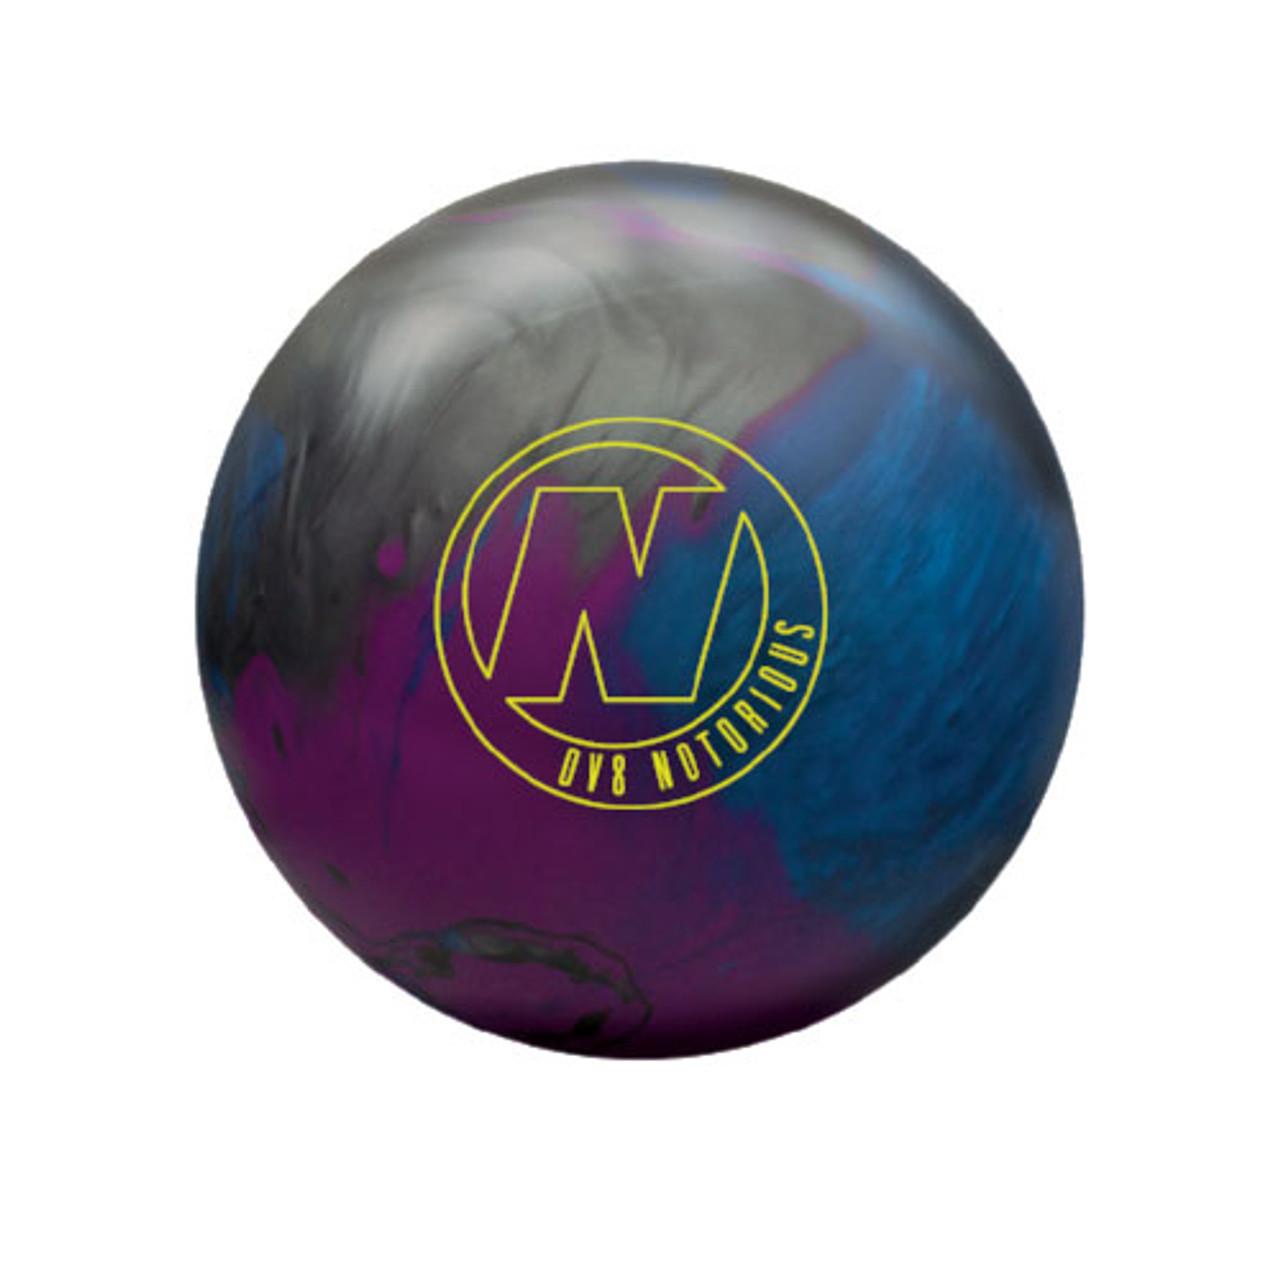 DV8 Notorious Bowling Ball